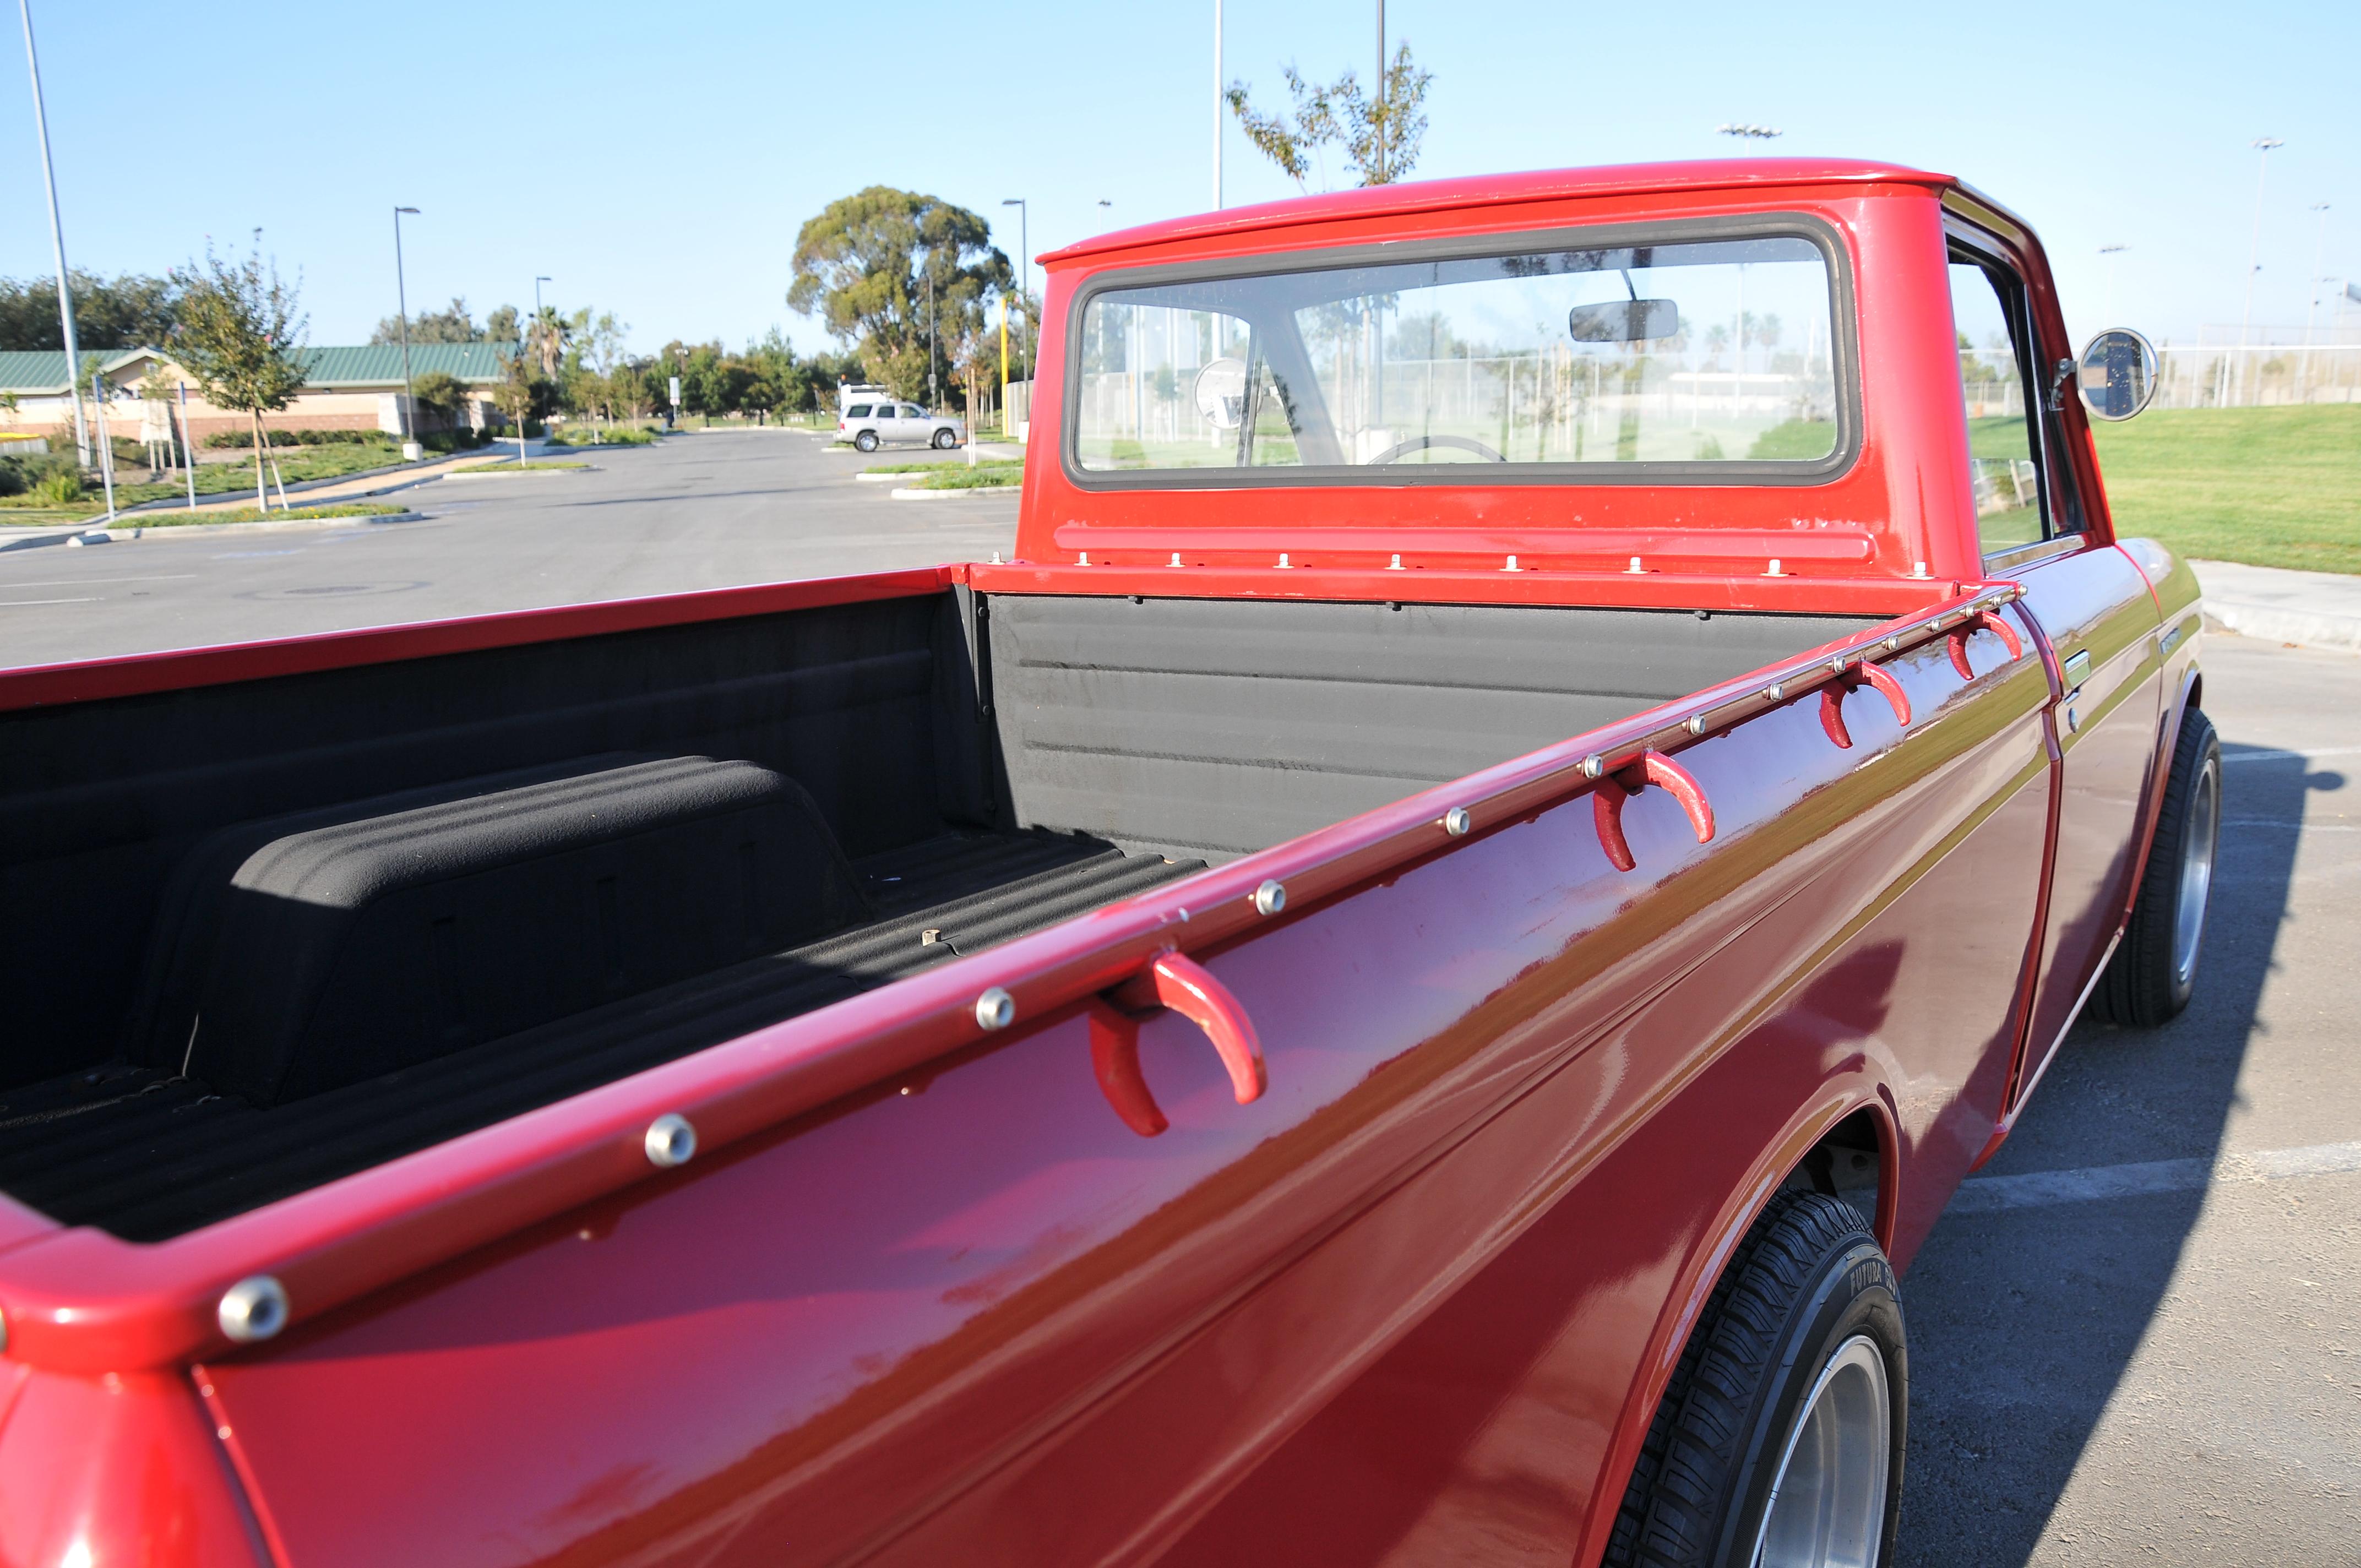 1969 Datsun 521 truck, bed hooks,Japanese Classic truck